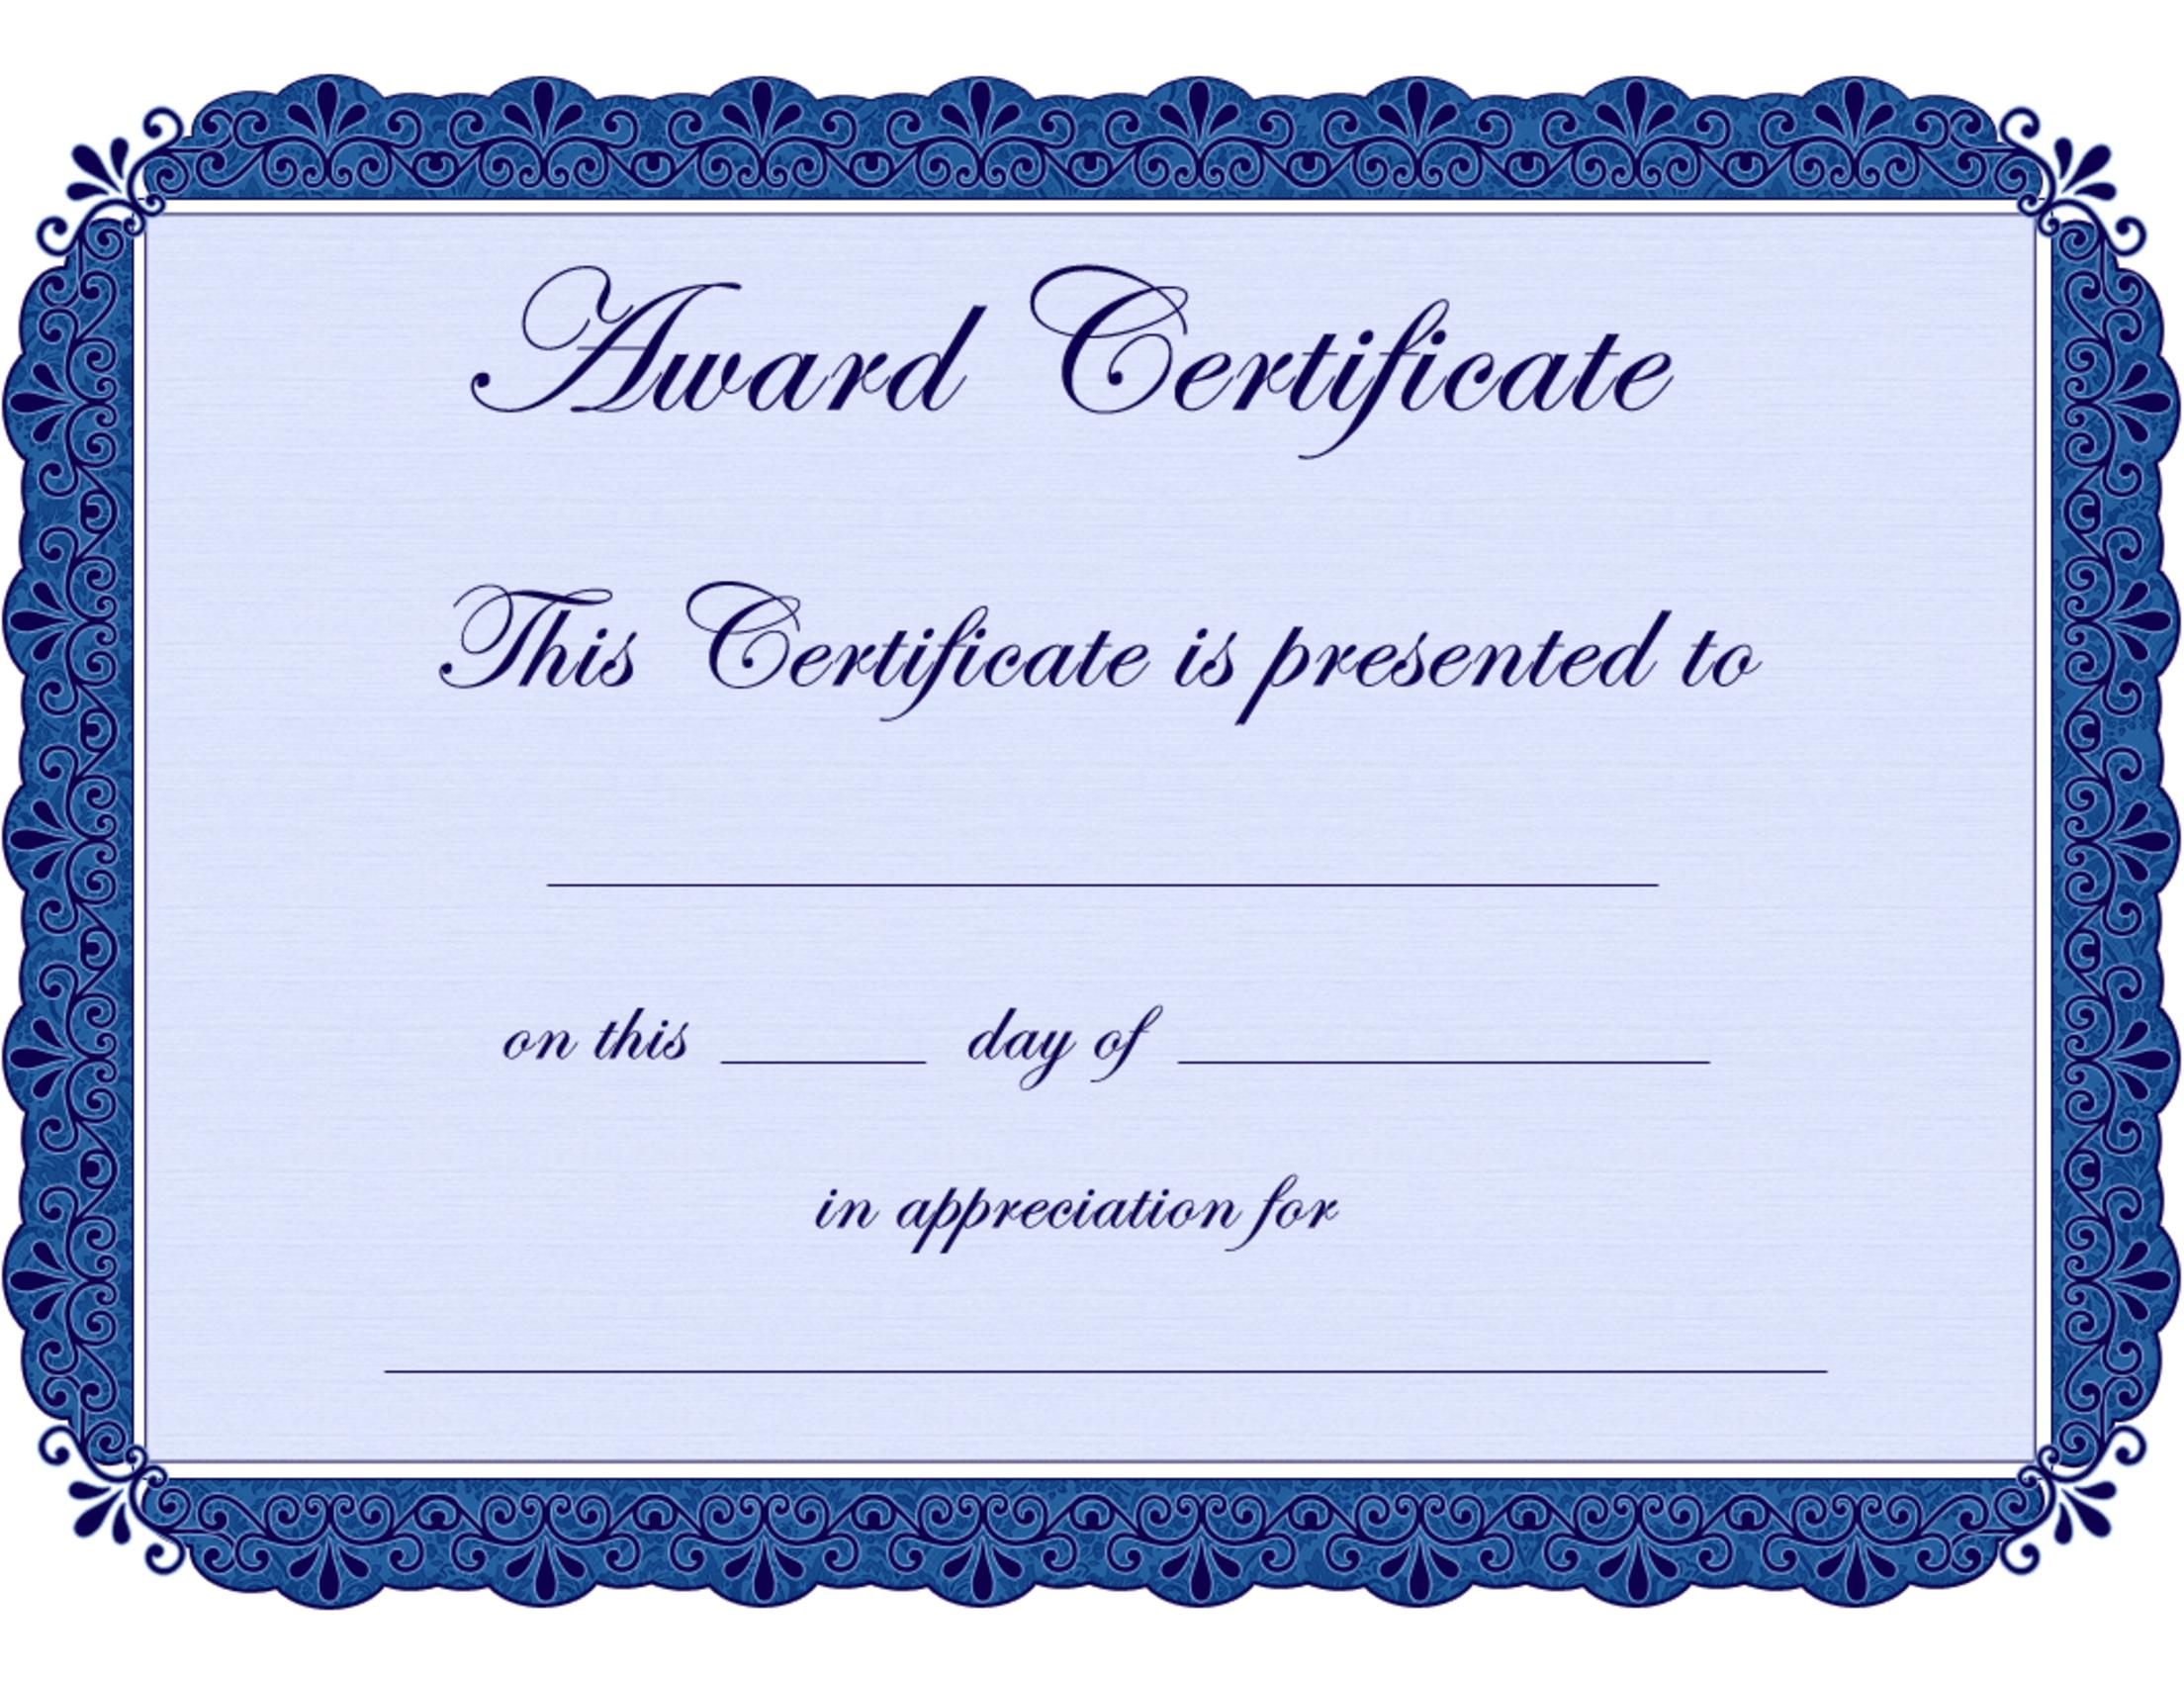 Free Printable Award Certificate Borders |  Award Certificate - Free Printable Certificates For Teachers